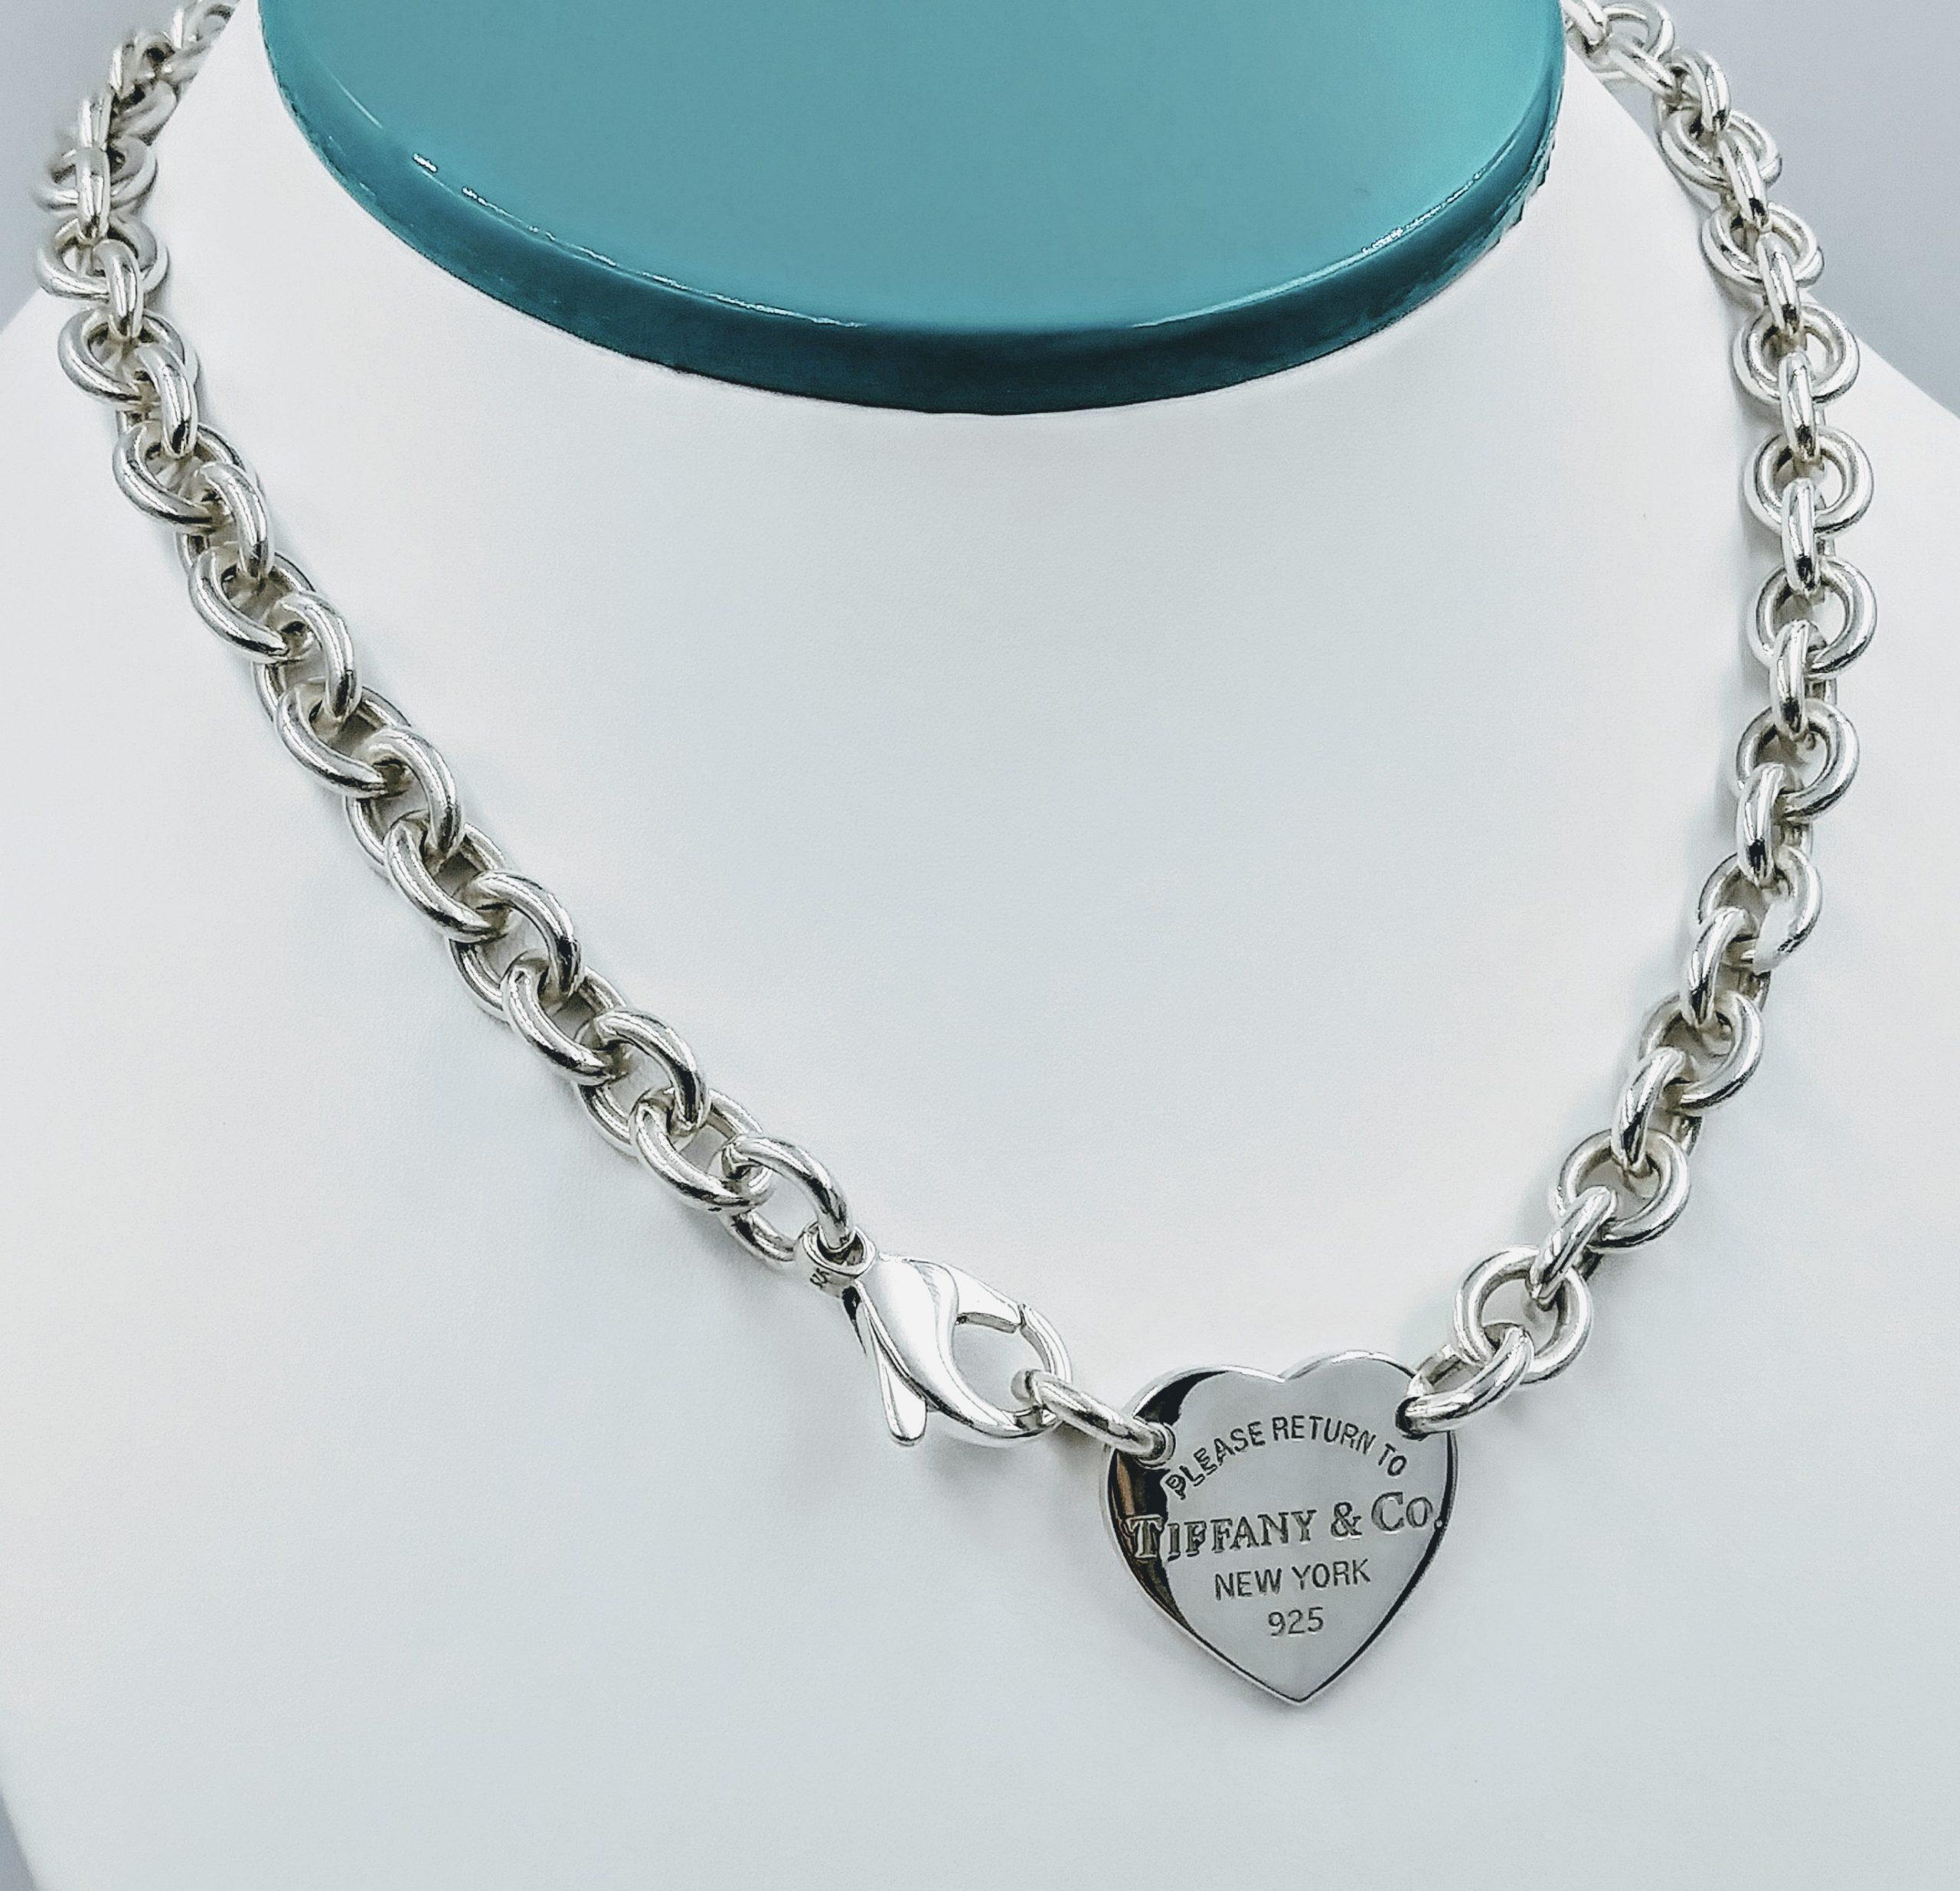 Tiffany Co 19 Please Return To Tiffany Co Heart Tag Choker Necklace Smartshop Jewelry